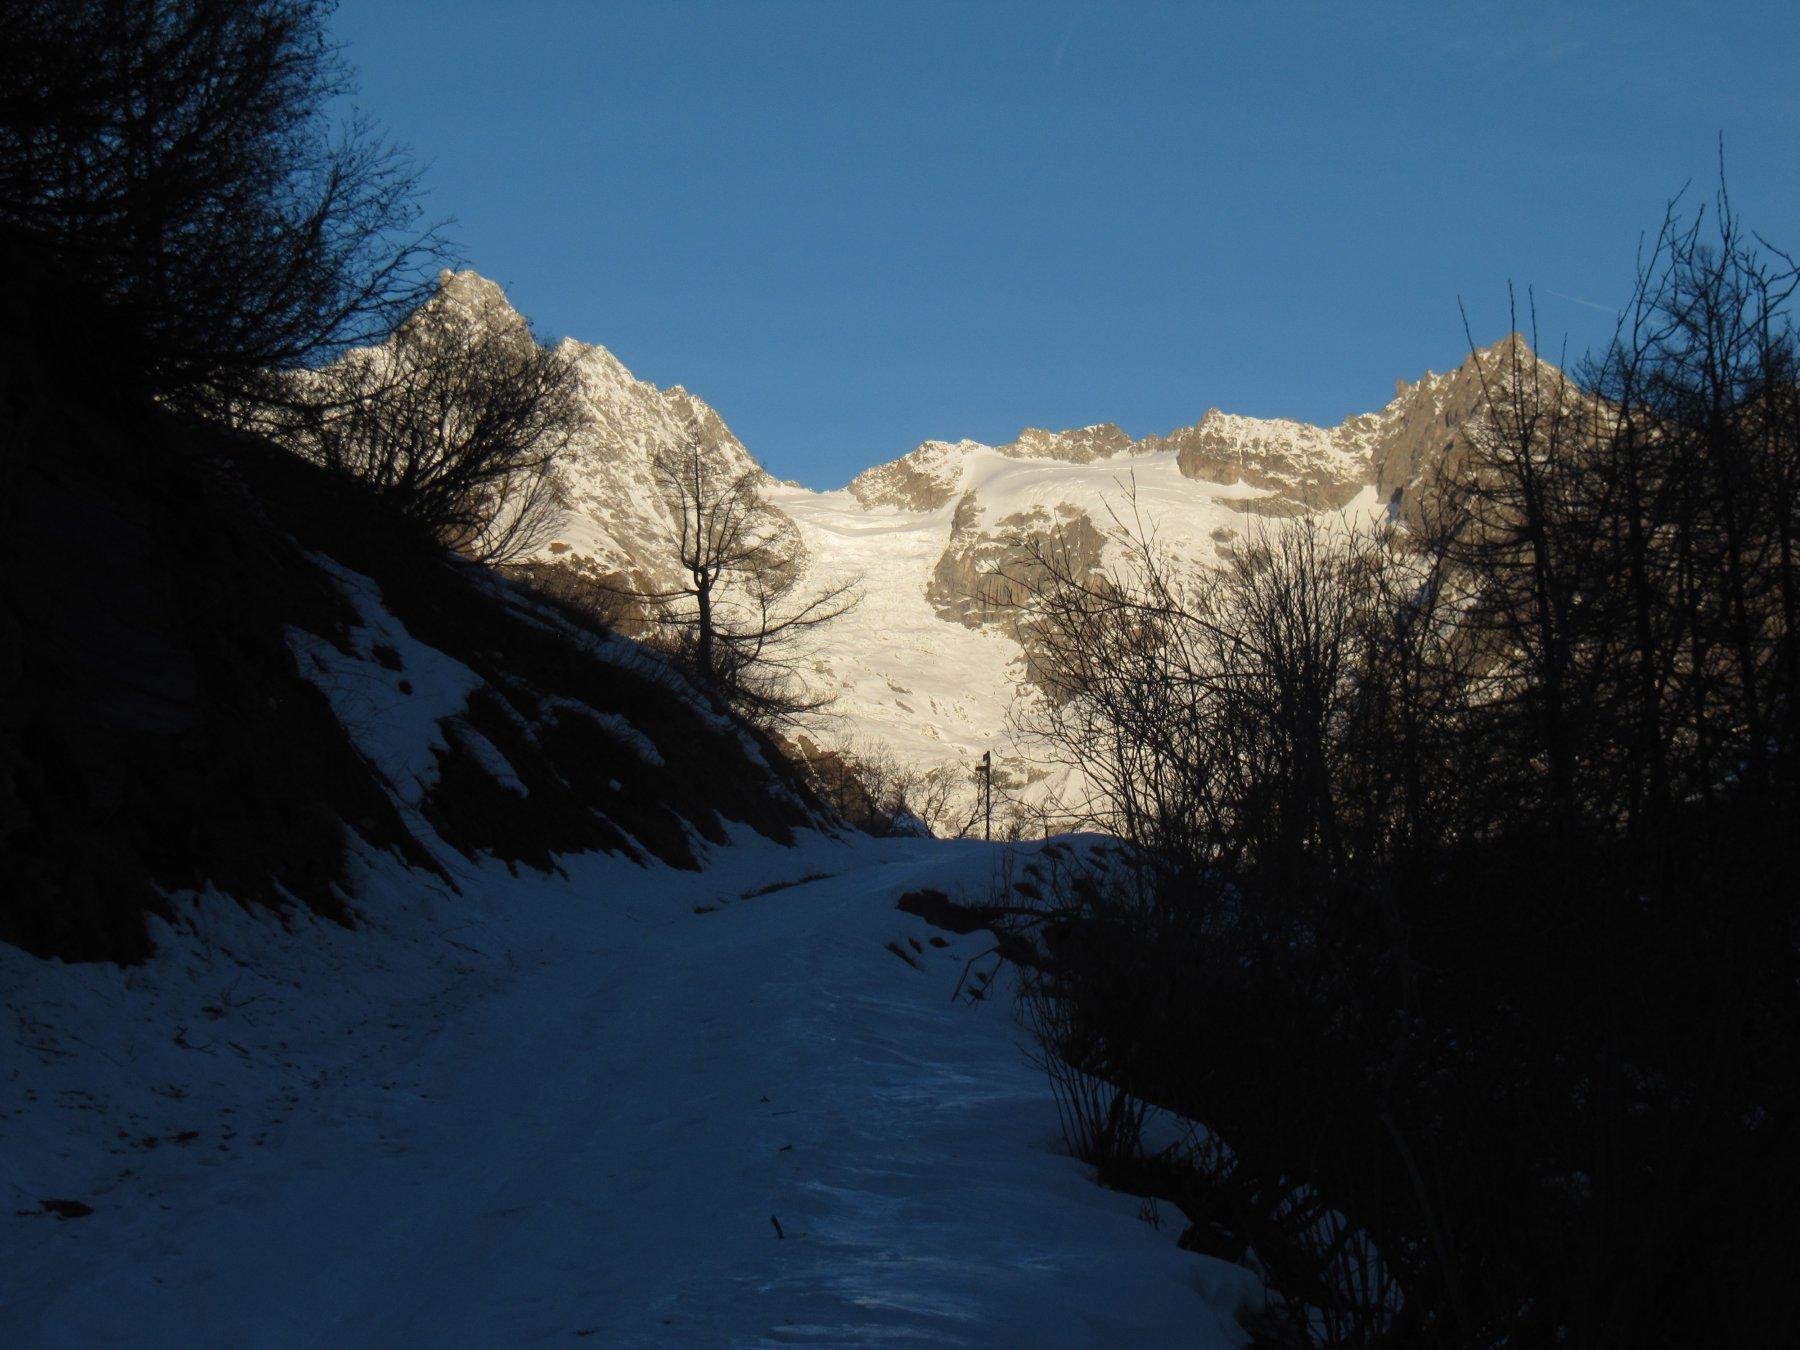 Salita all'alpeggio de La Peule